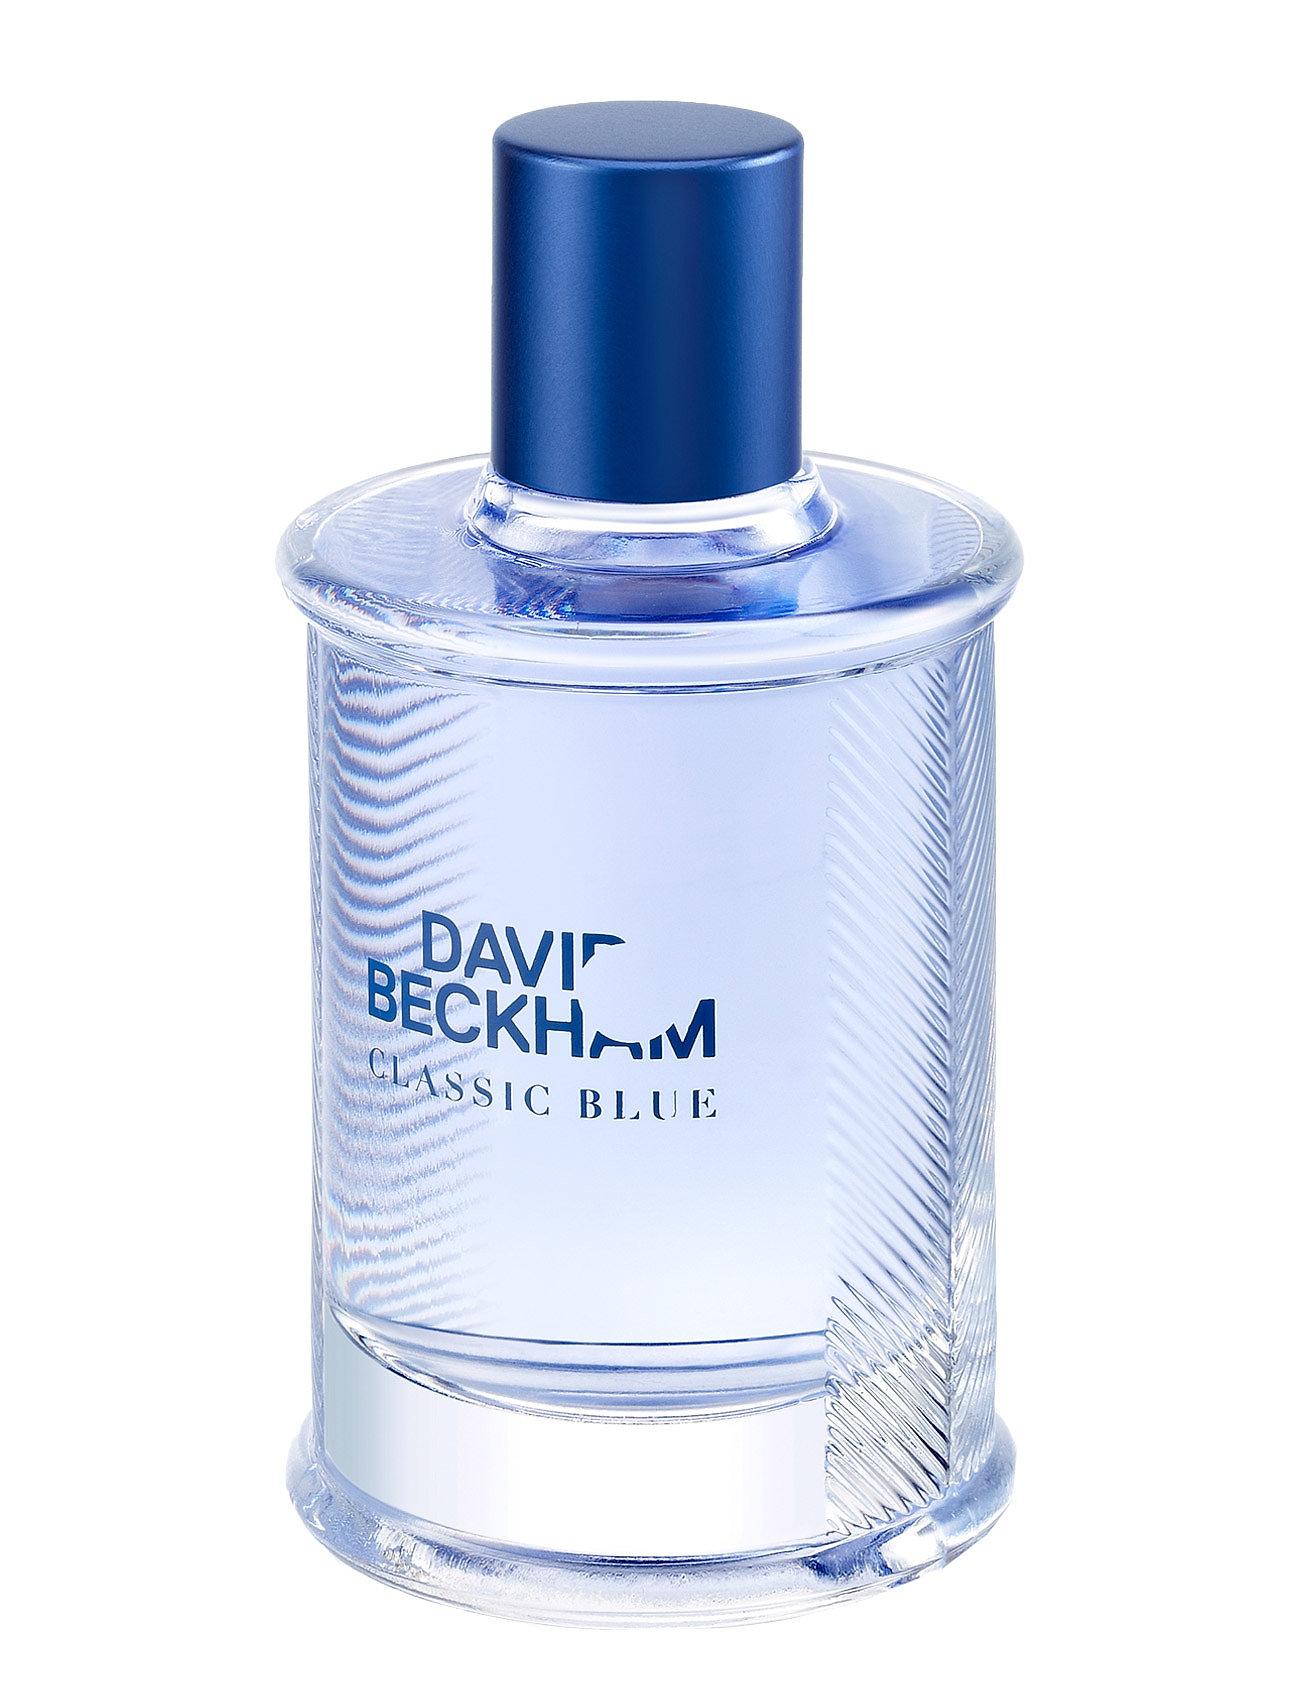 david beckham David beckham classic blue eau de t fra boozt.com dk